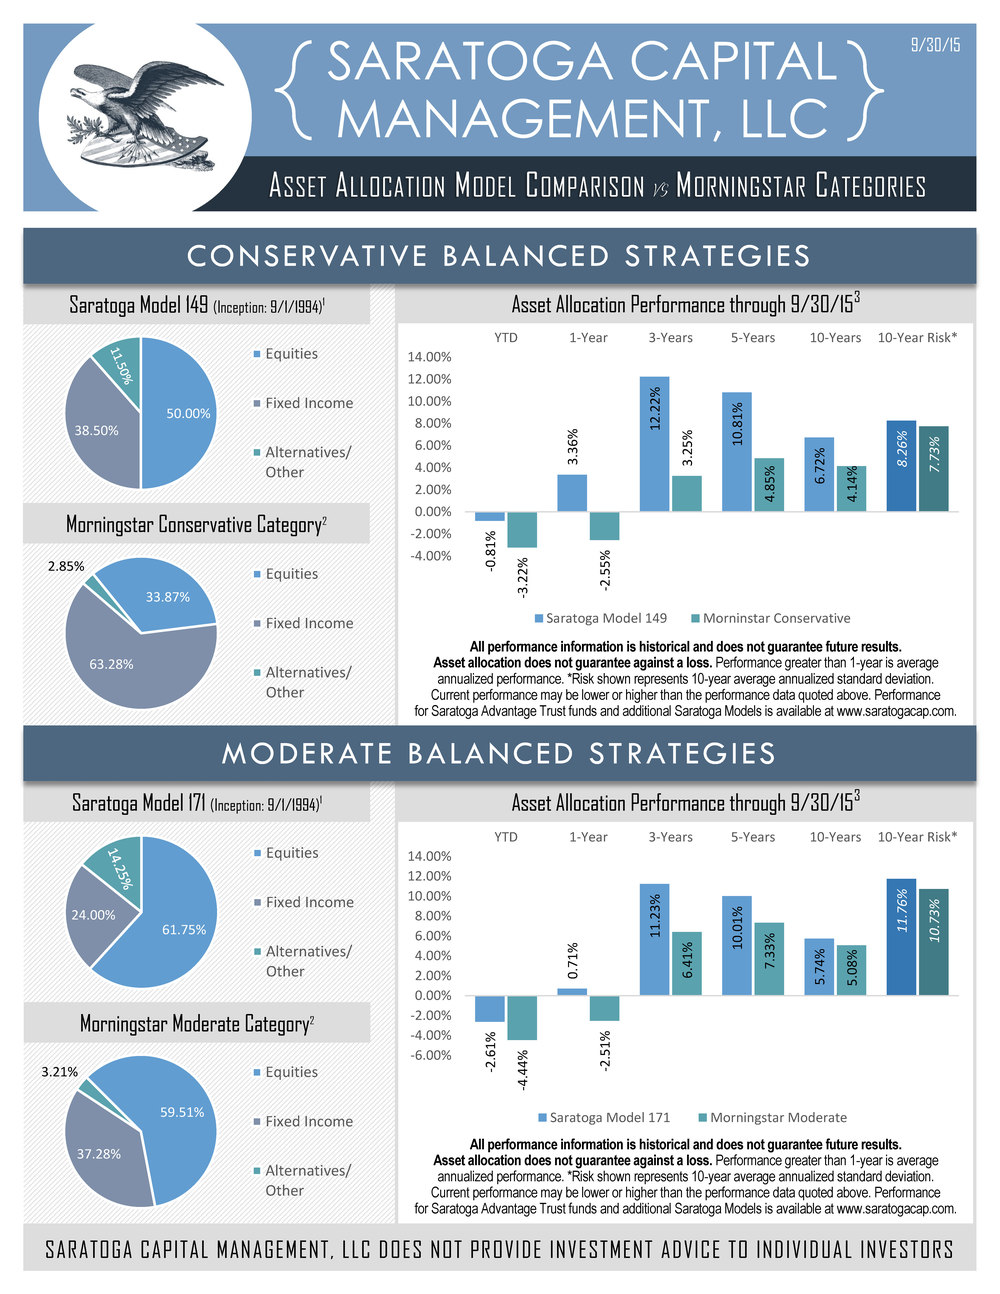 2015-09-30 - SCM Model Performance Versus Morningstar_Page_1.jpg